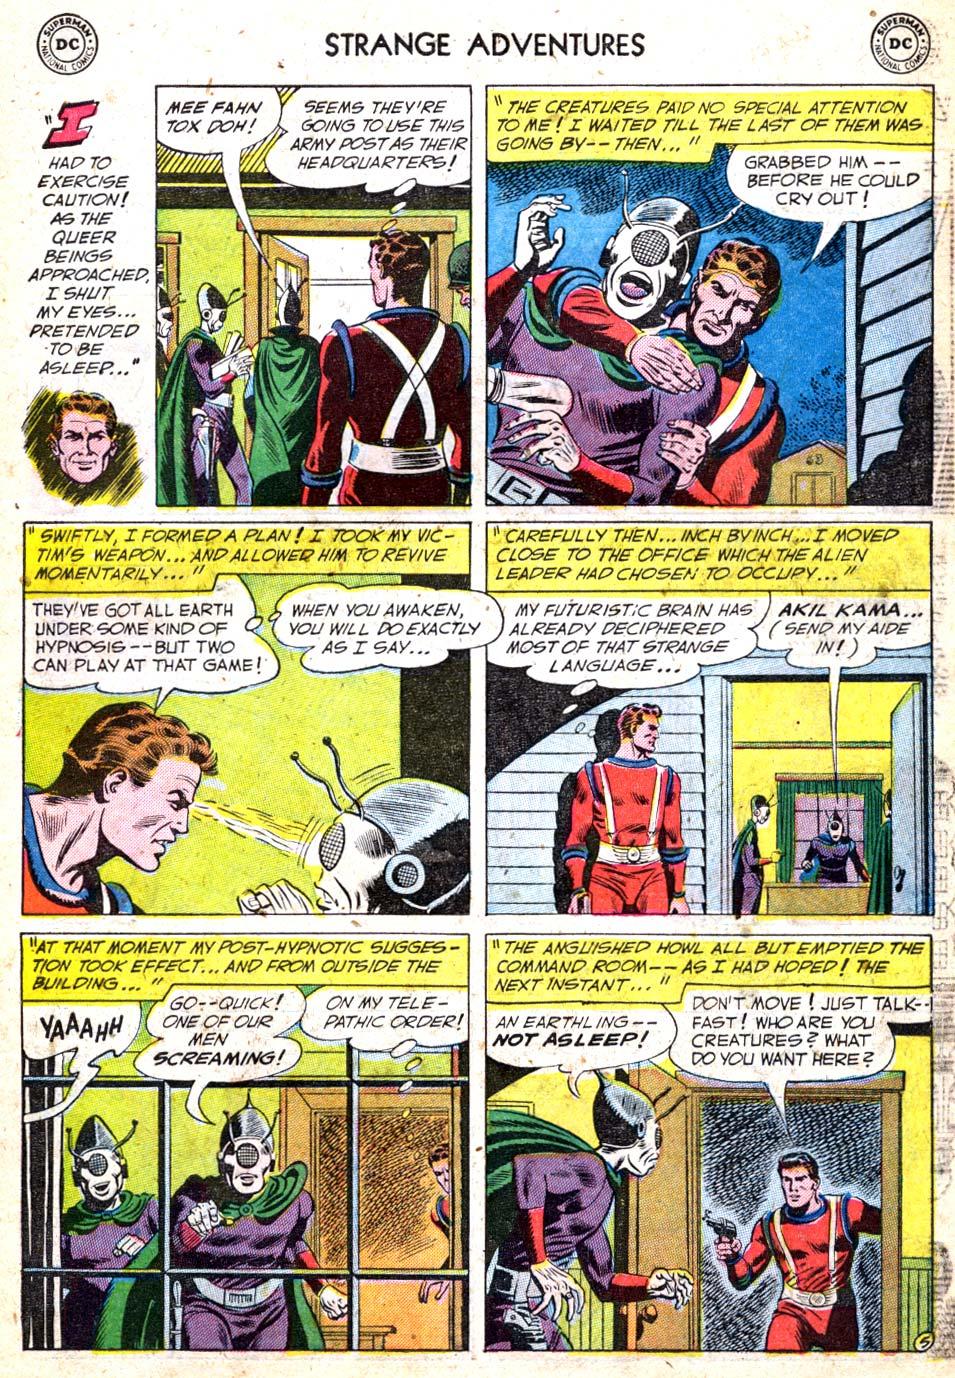 Strange Adventures (1950) issue 25 - Page 7